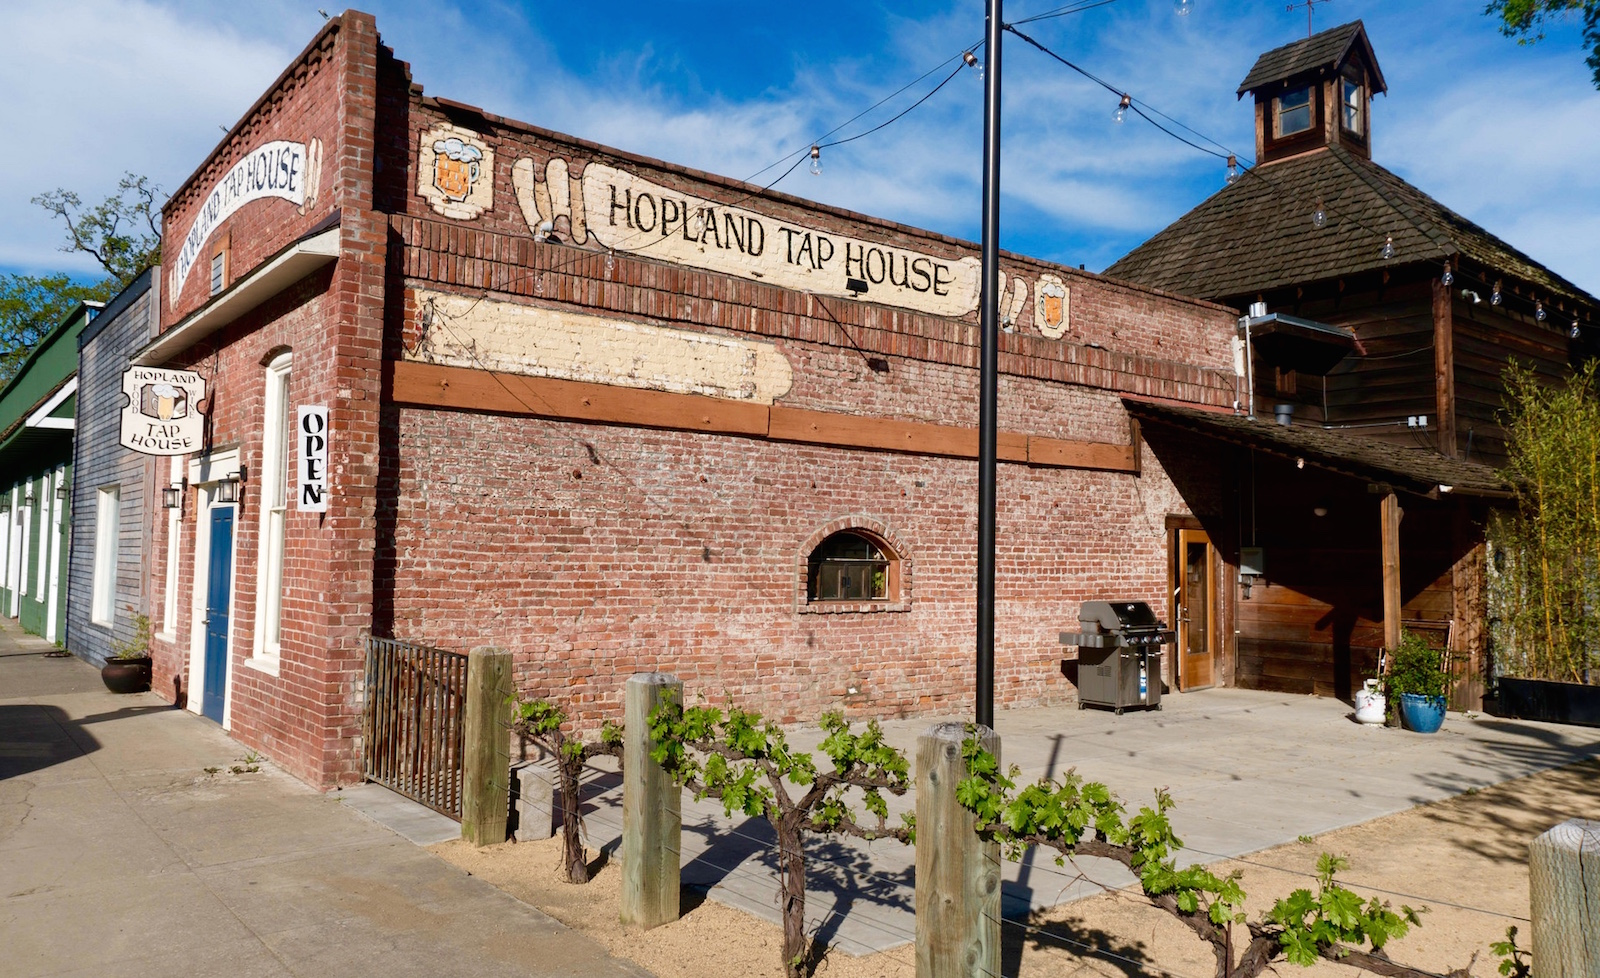 Hopland, California